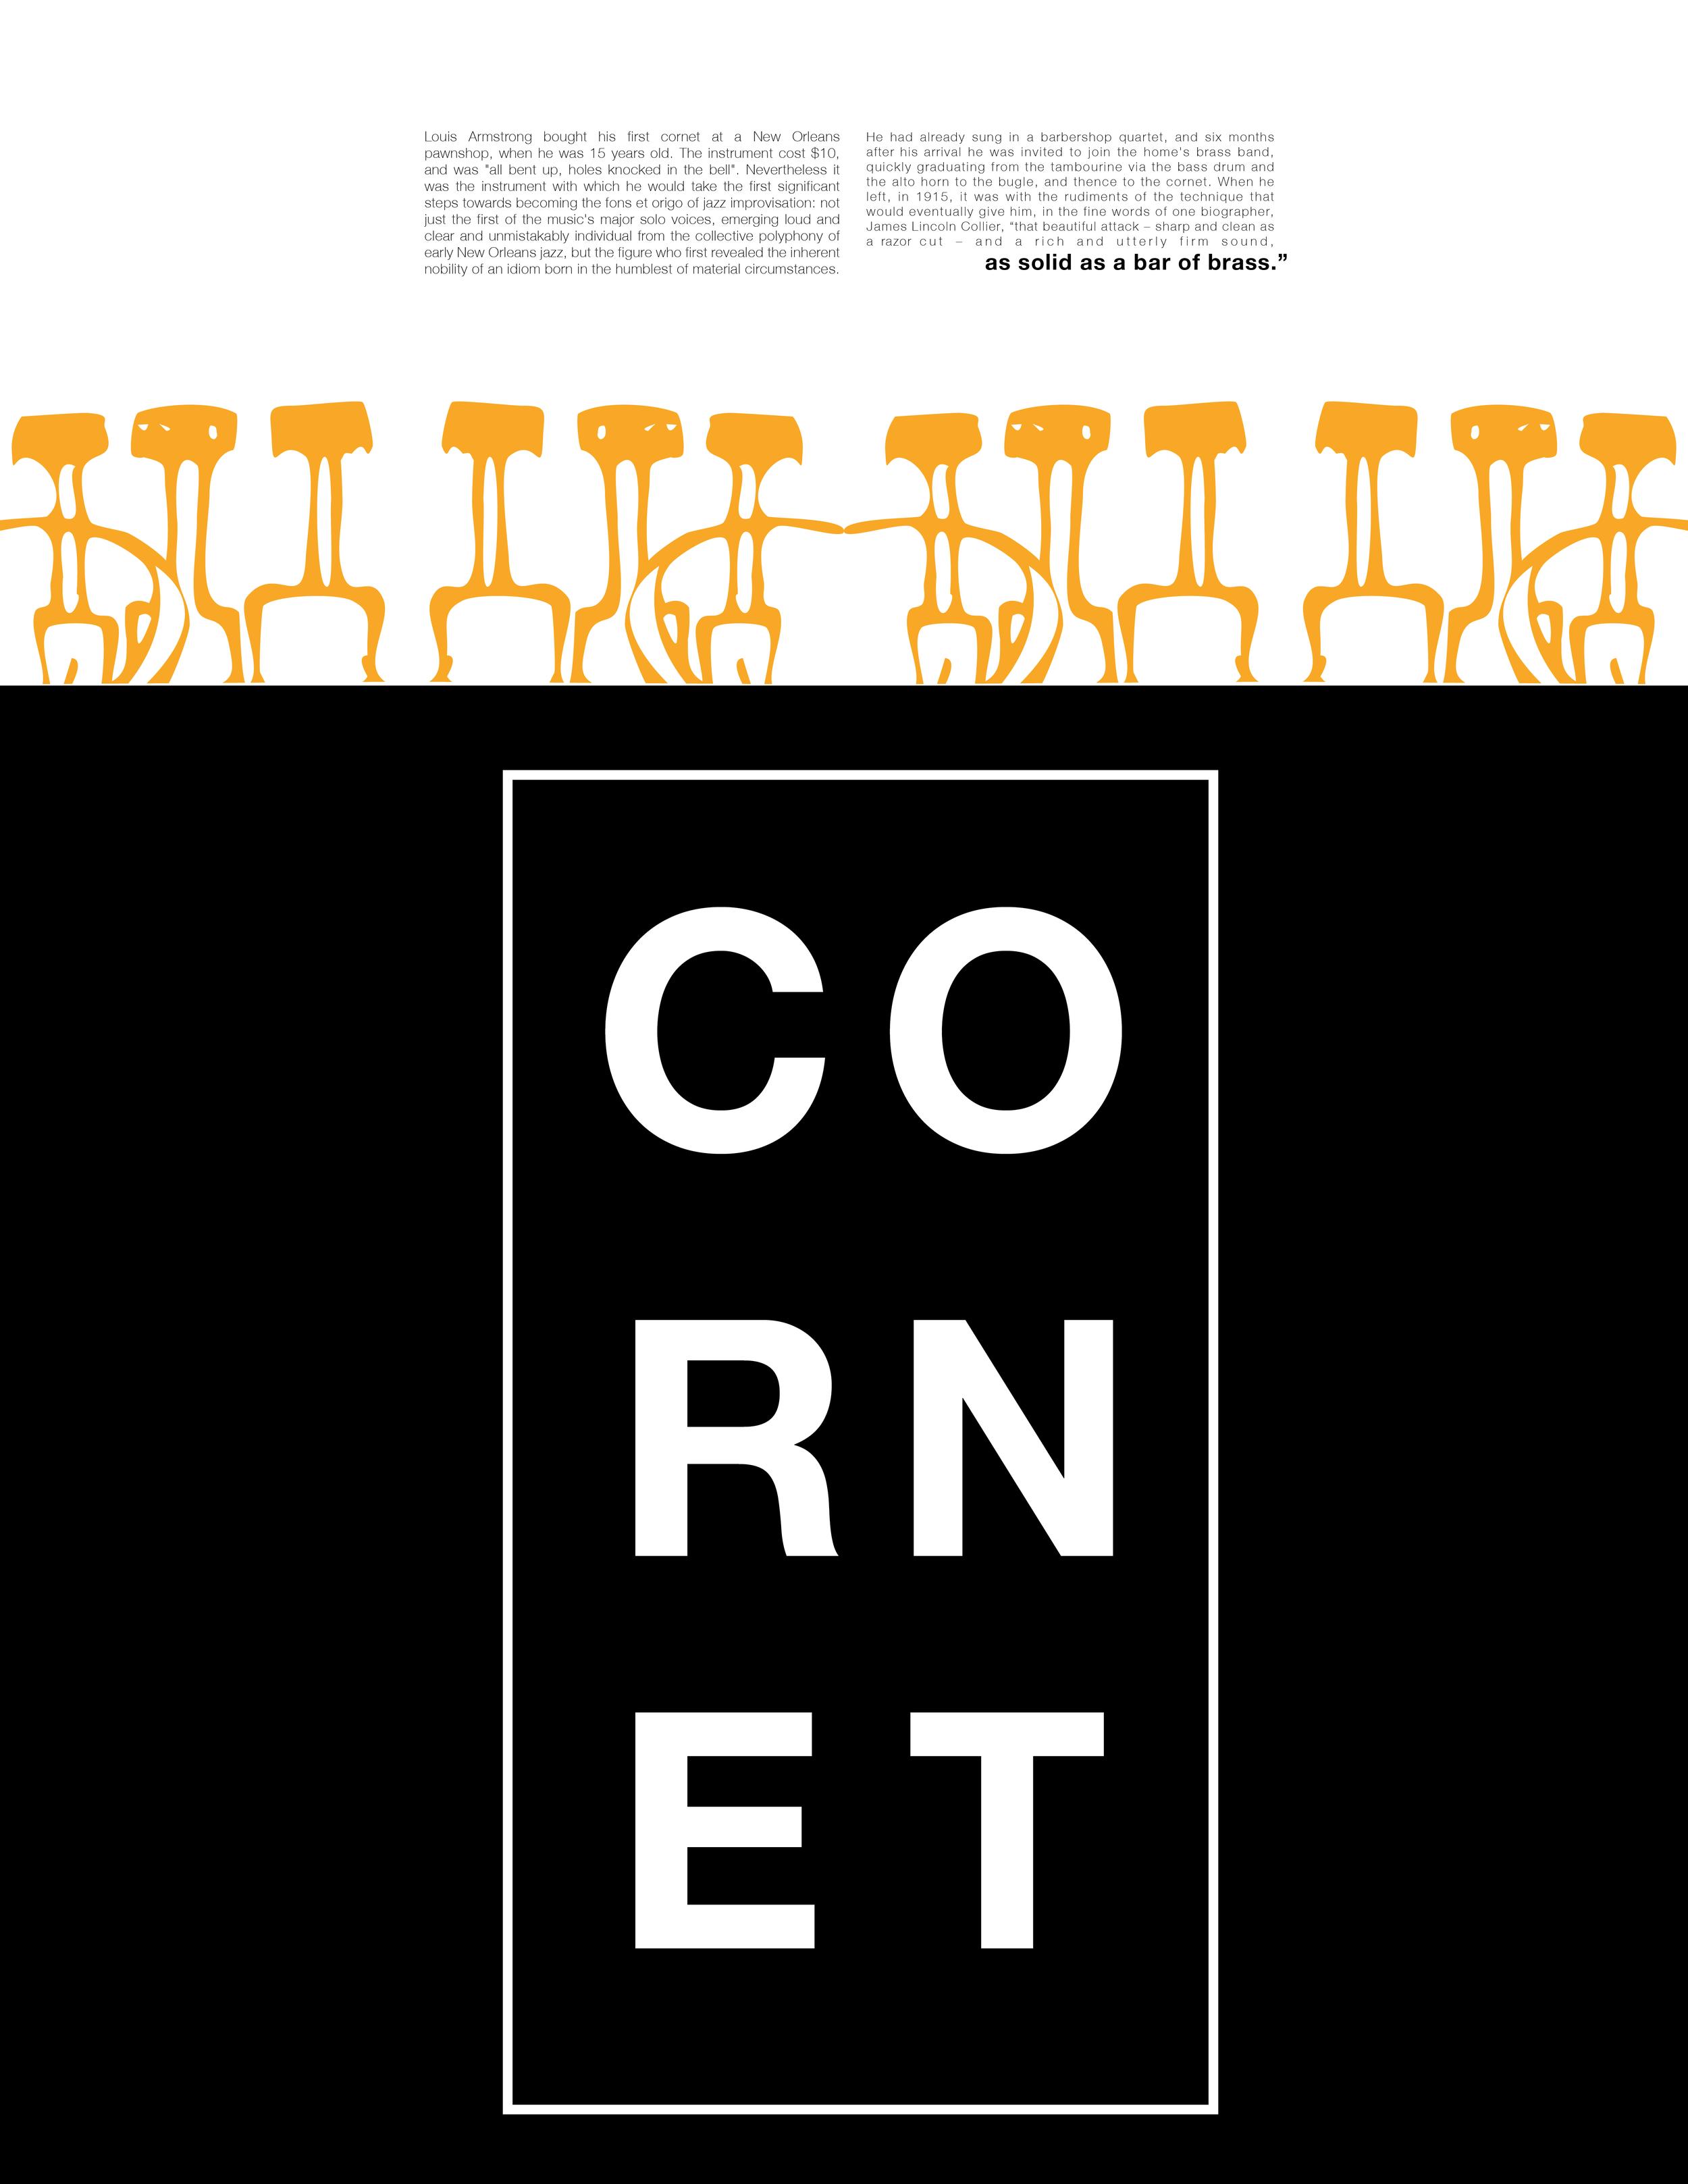 Cornet_Final_Contenders-08.png